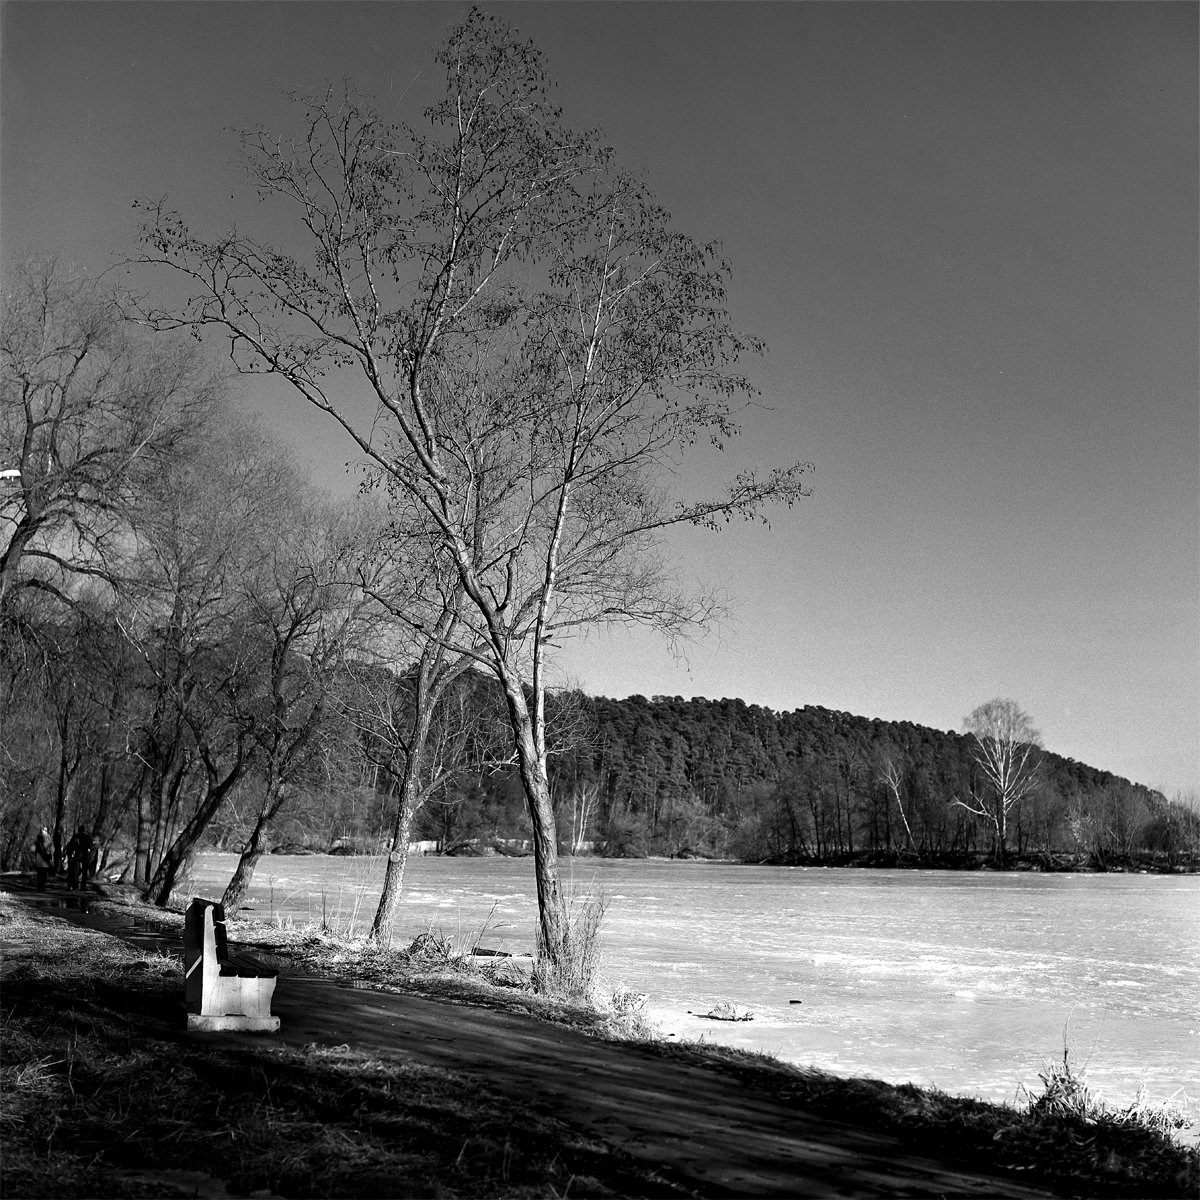 Весна., Парк., Река., Александр Резников